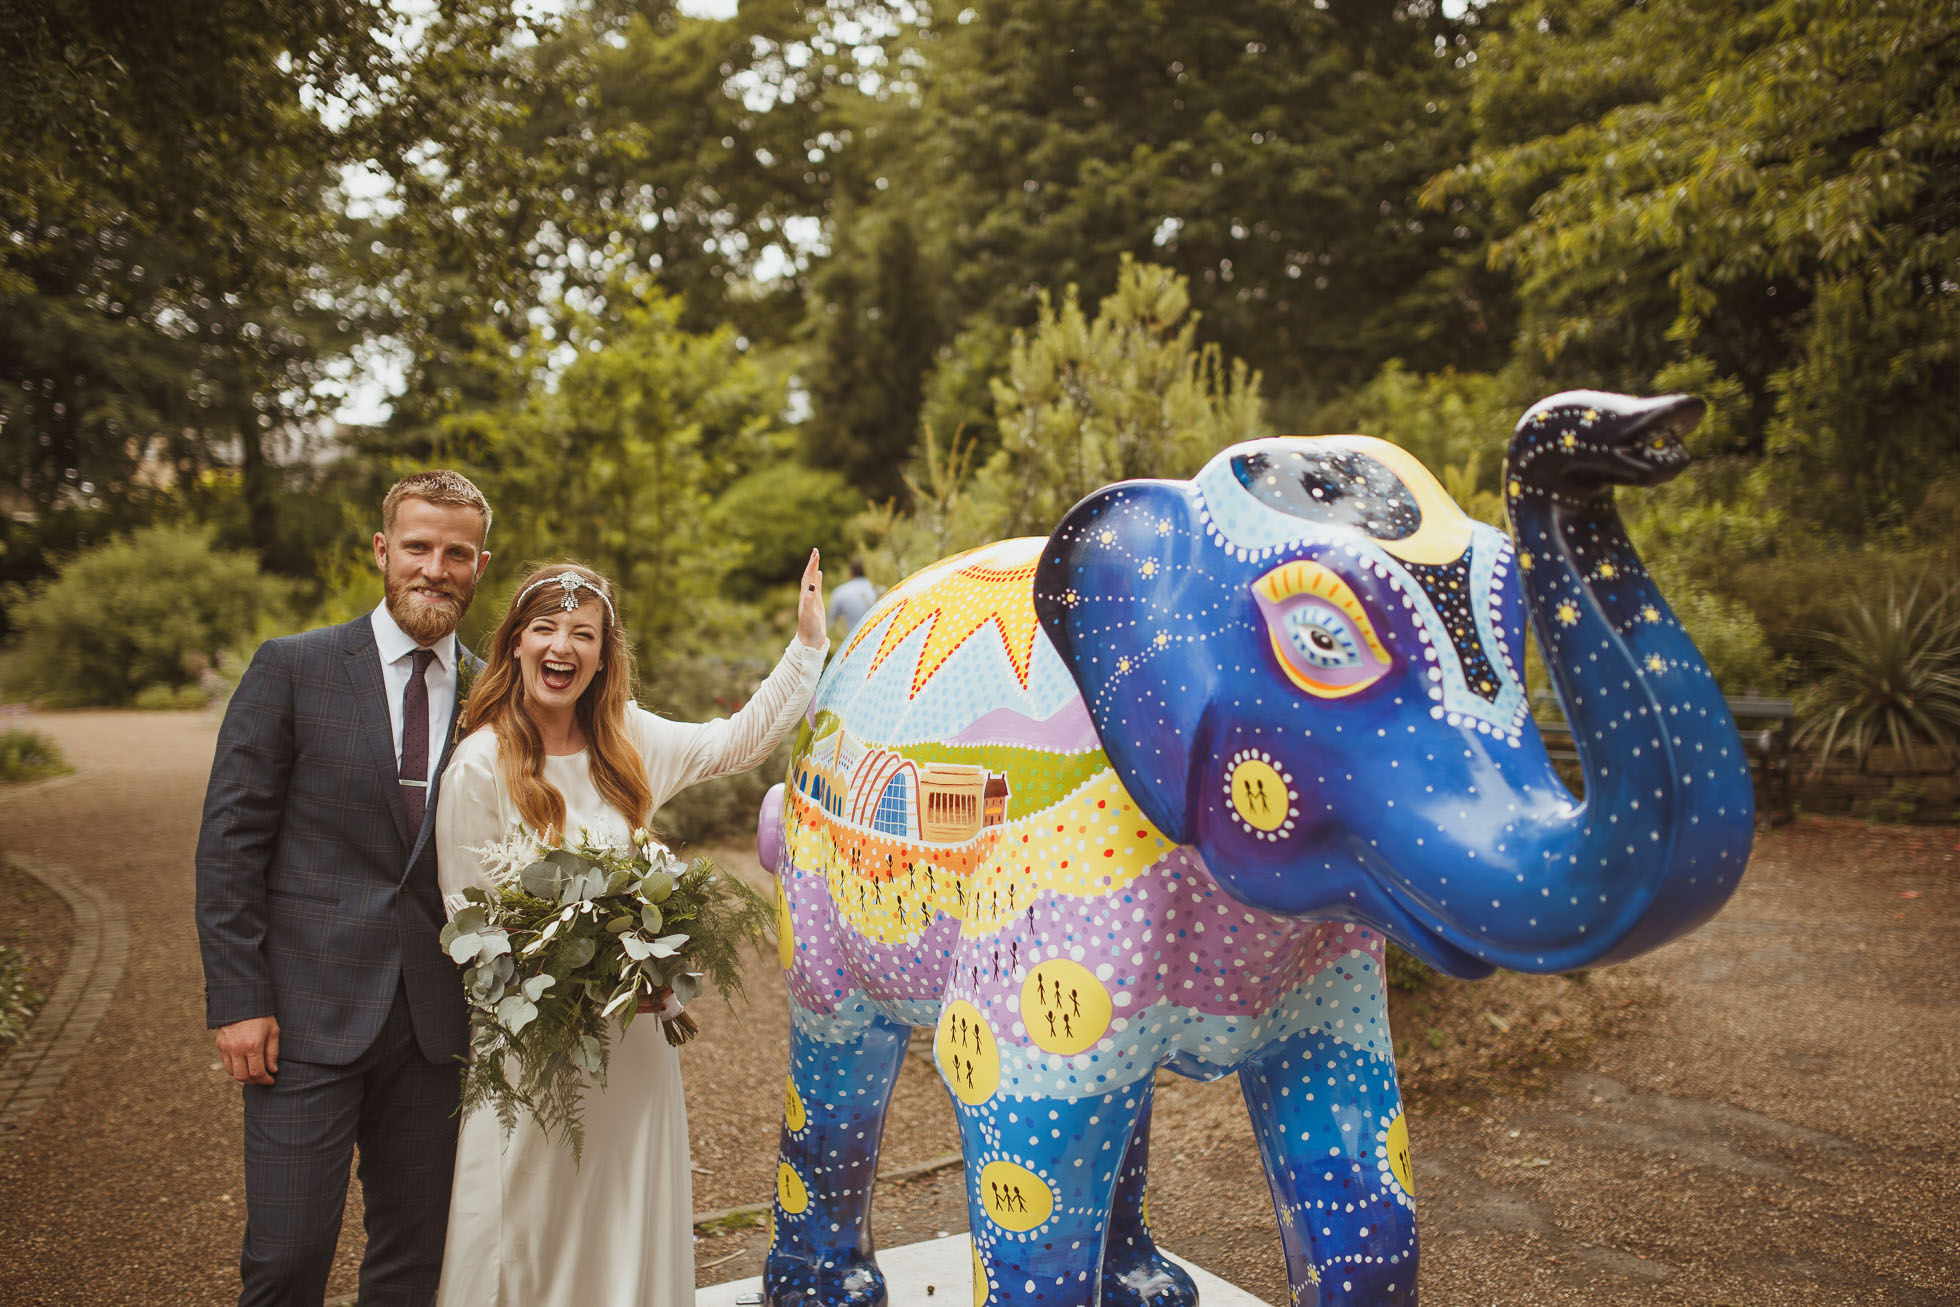 sheffield-botanical-gardens-wedding-photographer-36.jpg